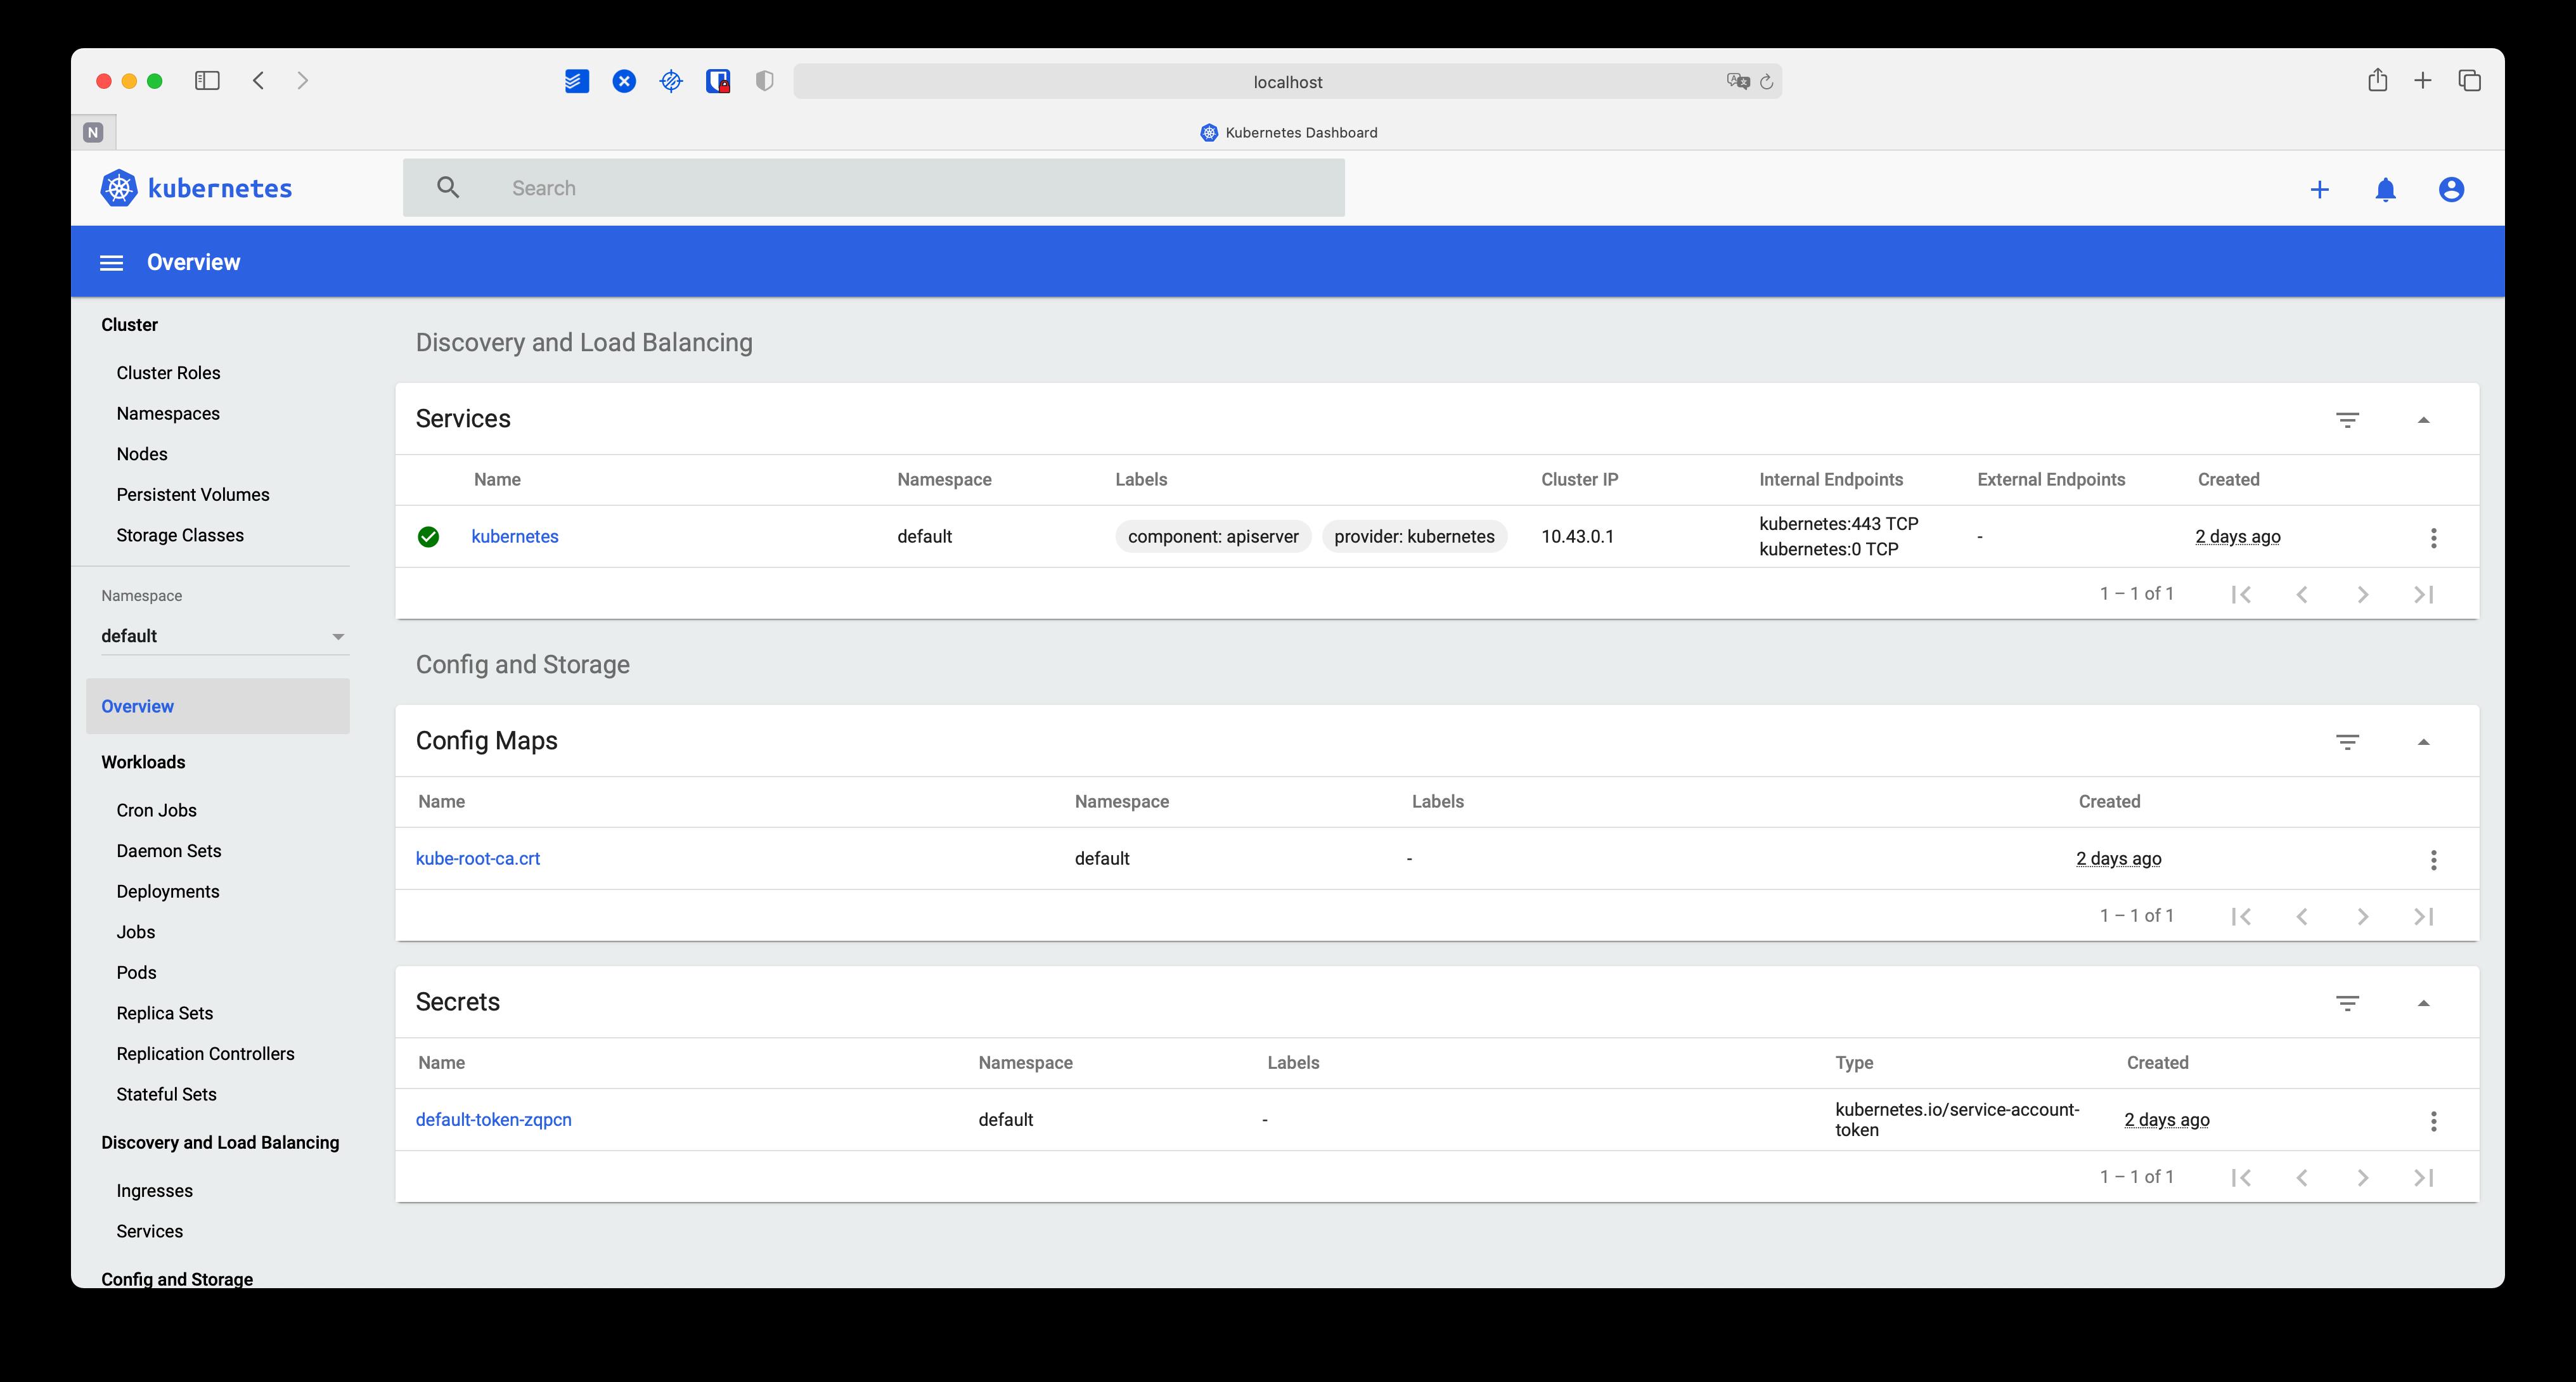 Web UI Initial Screen